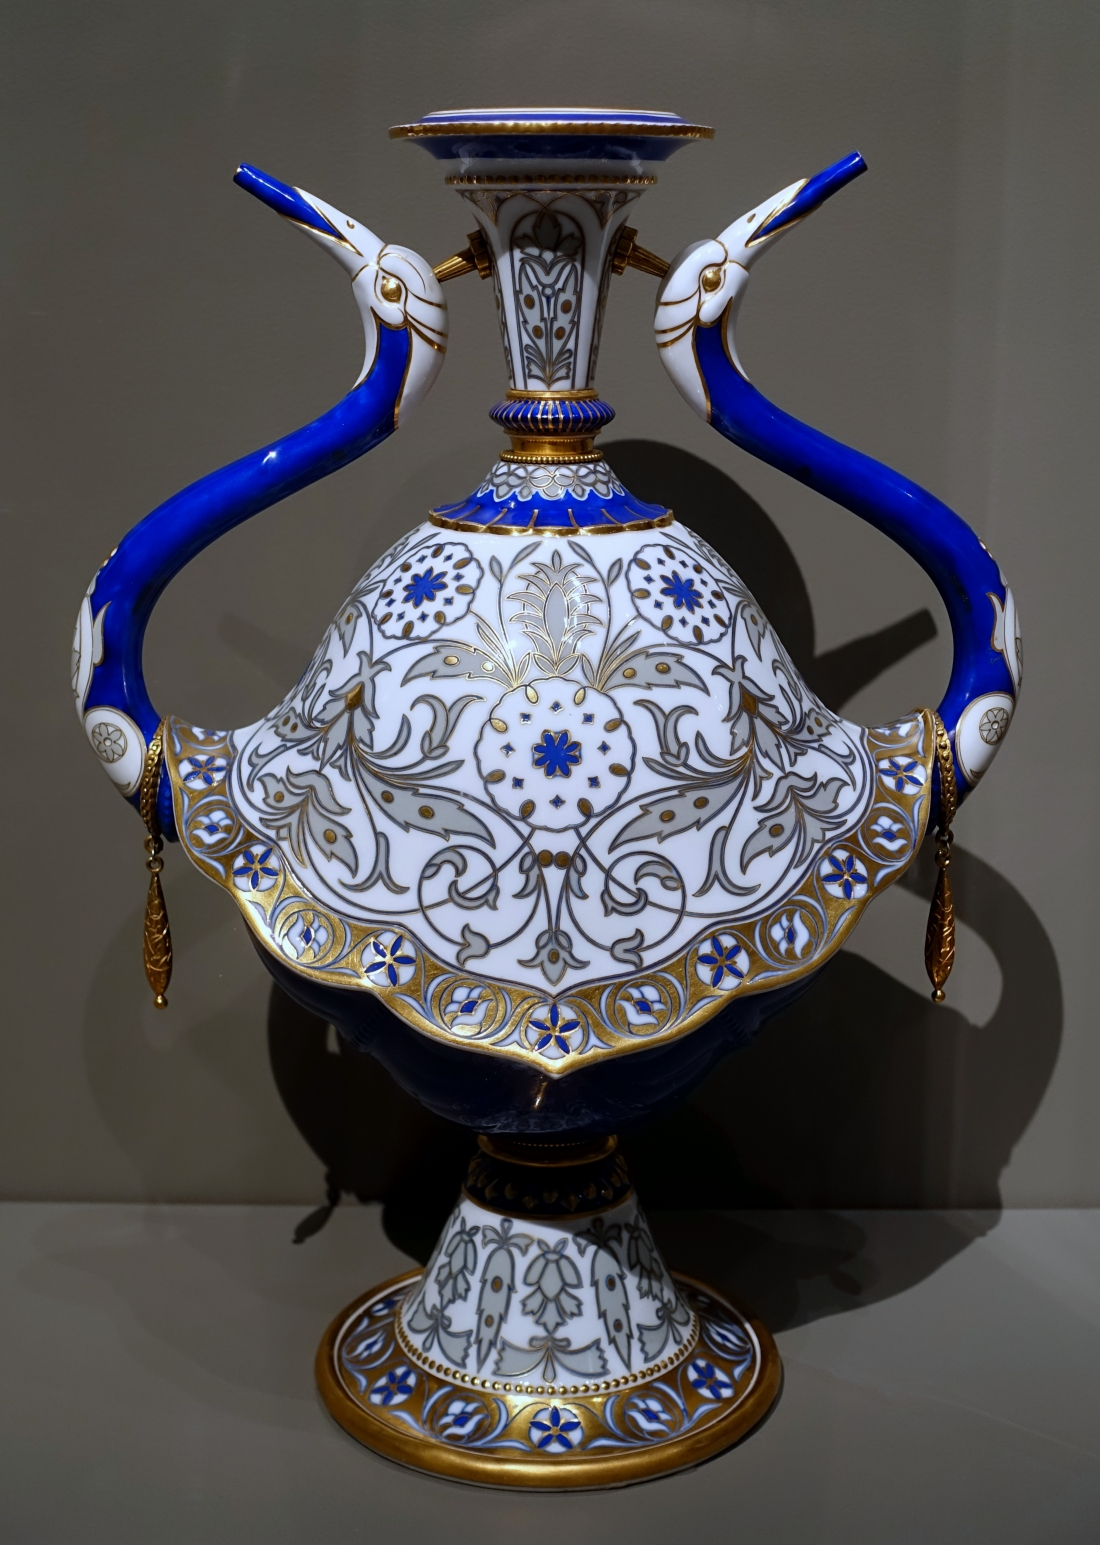 Ewer,_designed_by_Jules-Pierre-Michel_Dieterl,_Sèvres_Porcelain_Factory,_1854,_hard-paste_porcelain_and_gilt_bronze_-_Wadsworth_Atheneum_-_Hartford,_CT_-_DSC05532